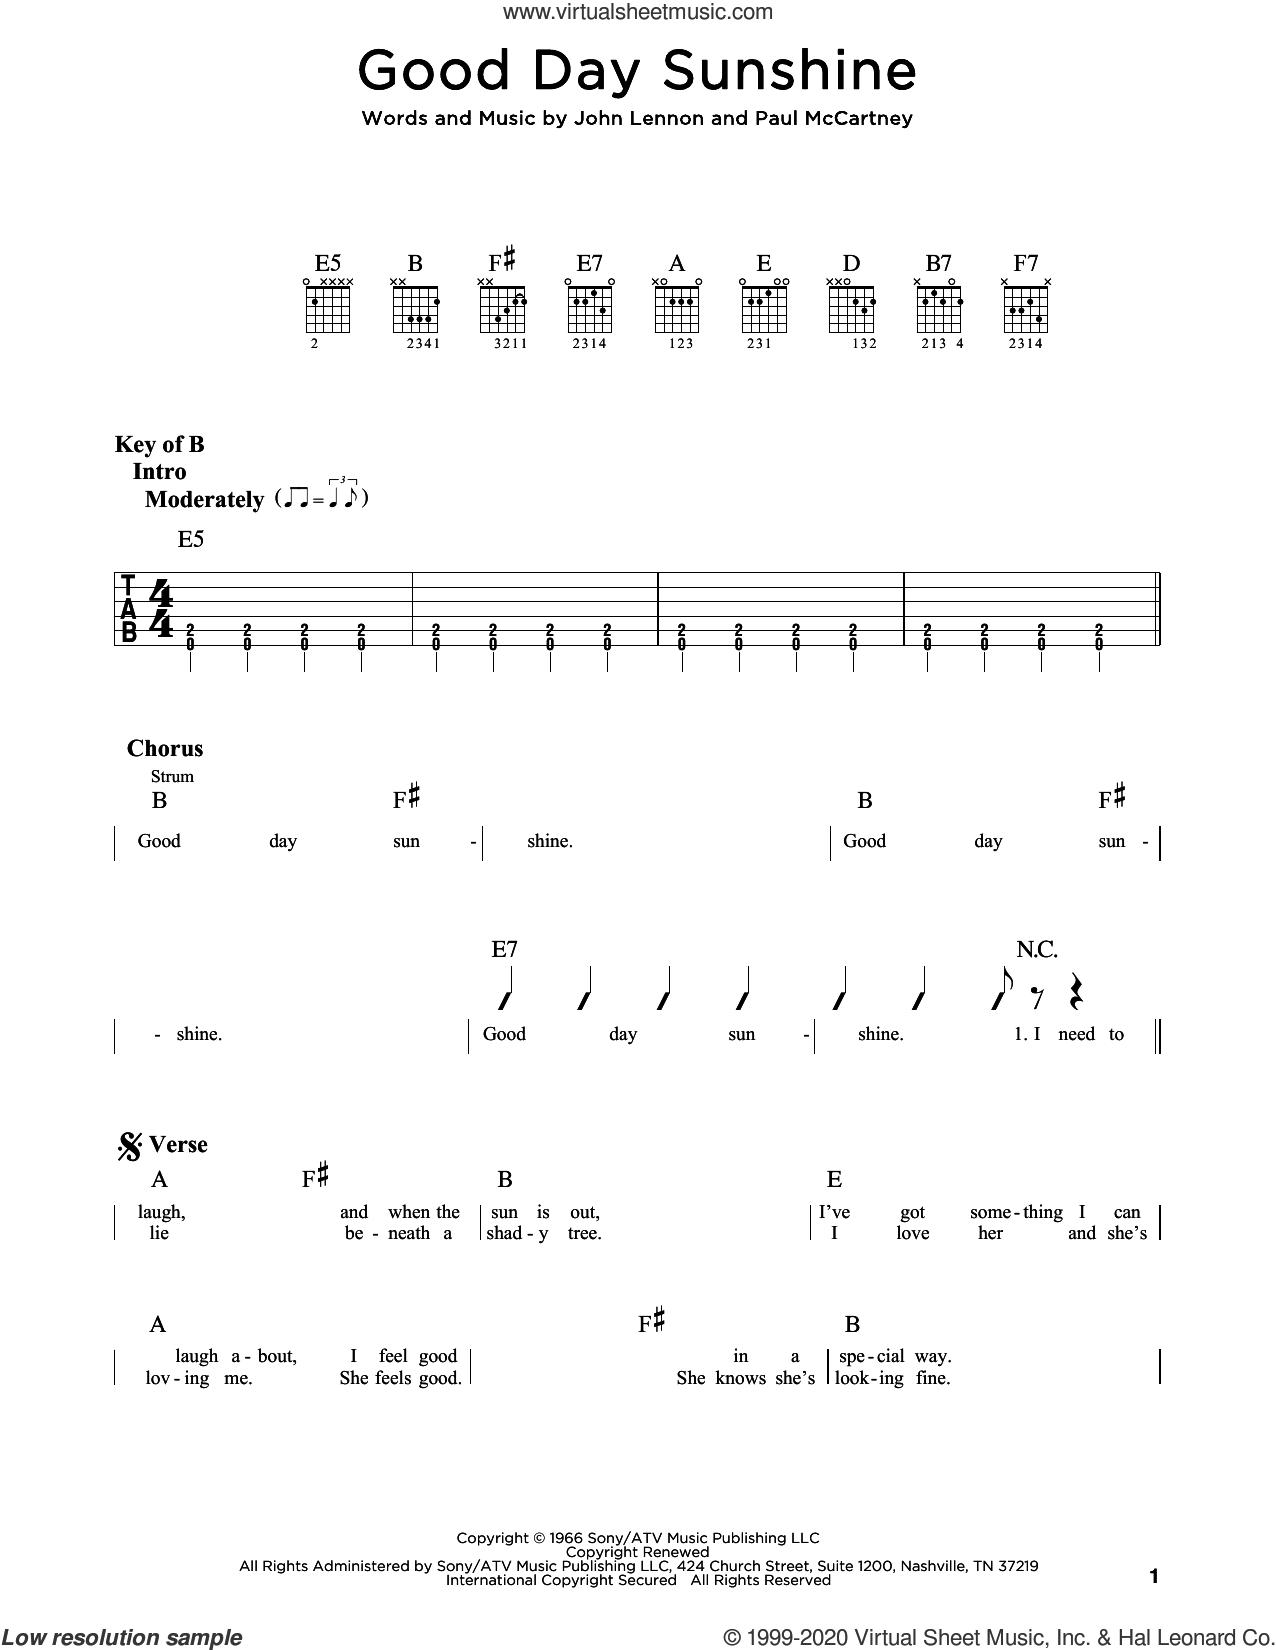 Good Day Sunshine sheet music for guitar (rhythm tablature) by The Beatles, John Lennon and Paul McCartney, intermediate skill level